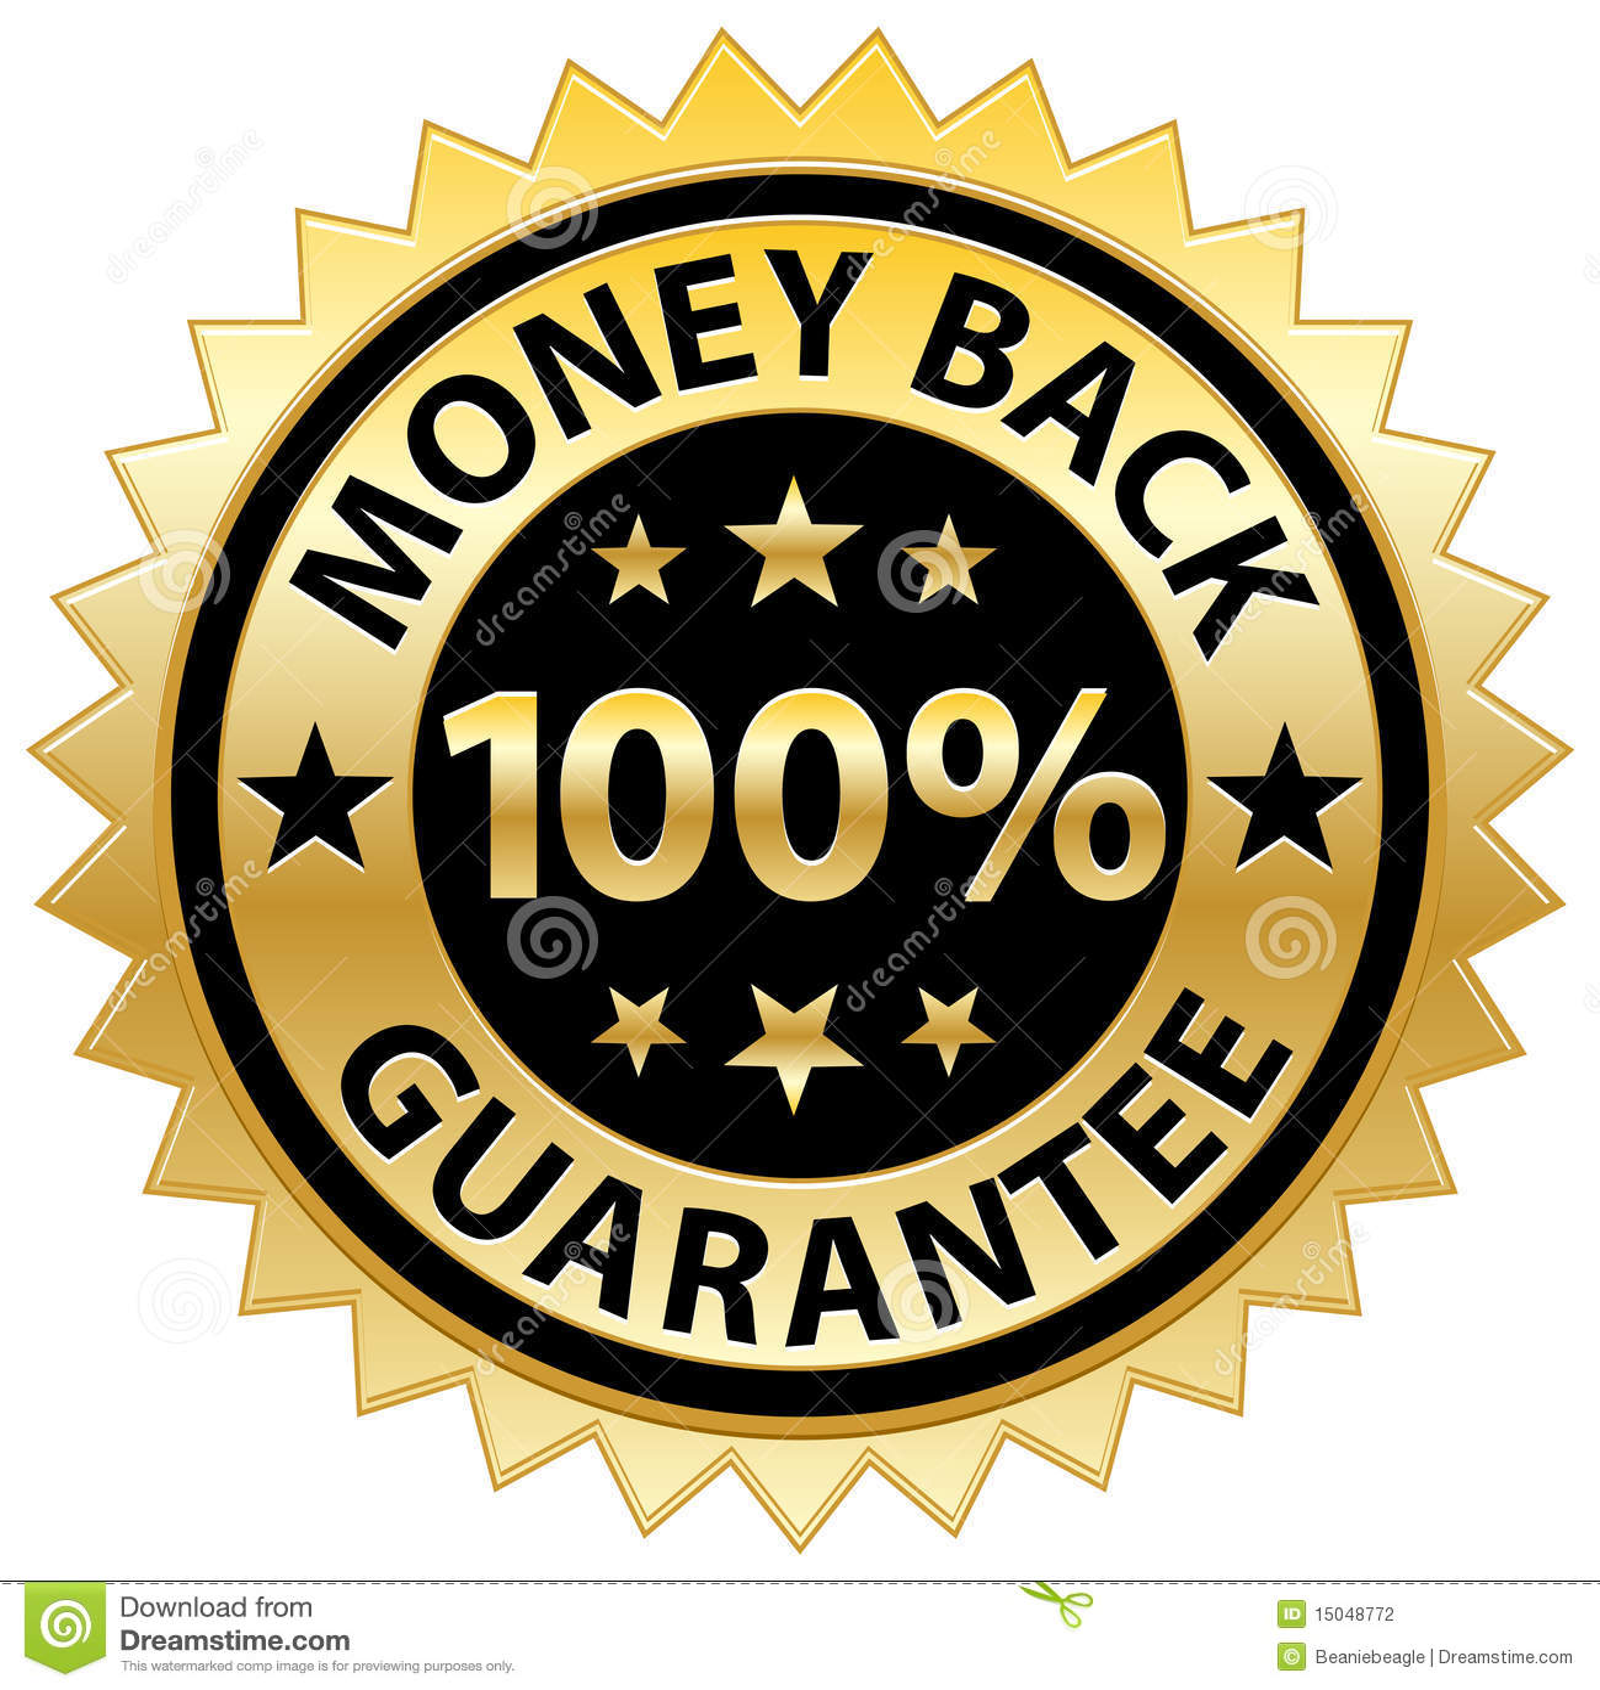 Tillbaka guaranteepengar